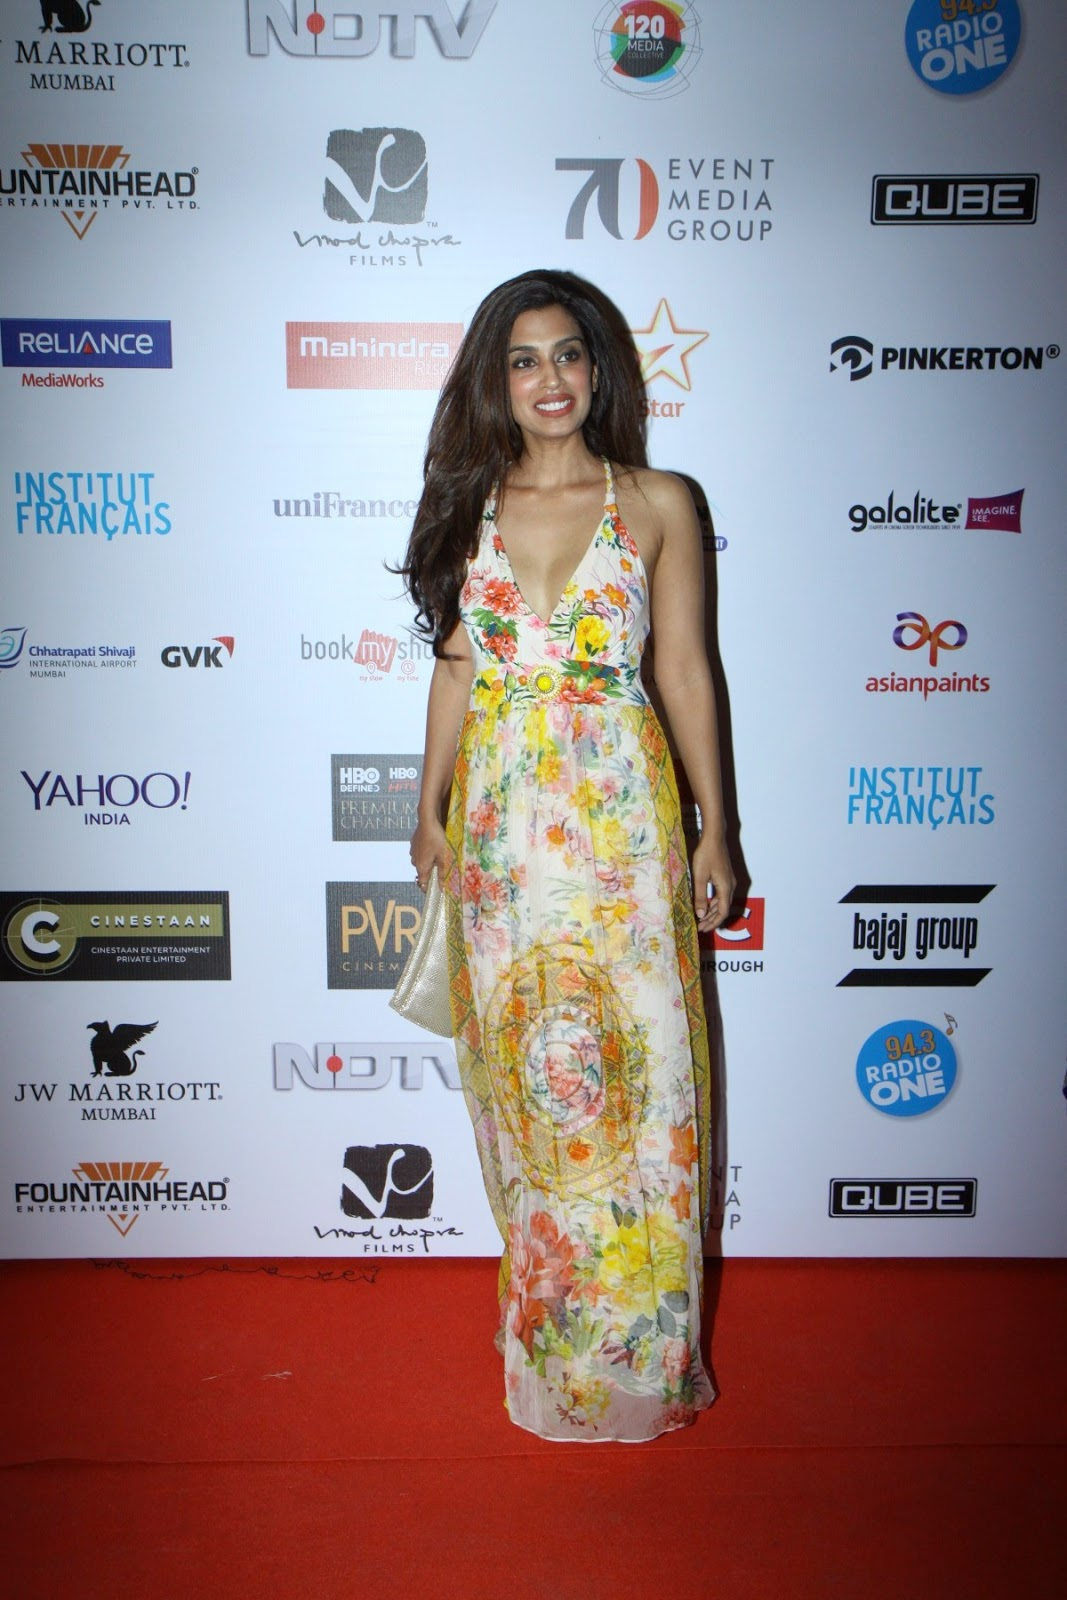 Celebs At 16th Mumbai Film Festival Opening Ceremony